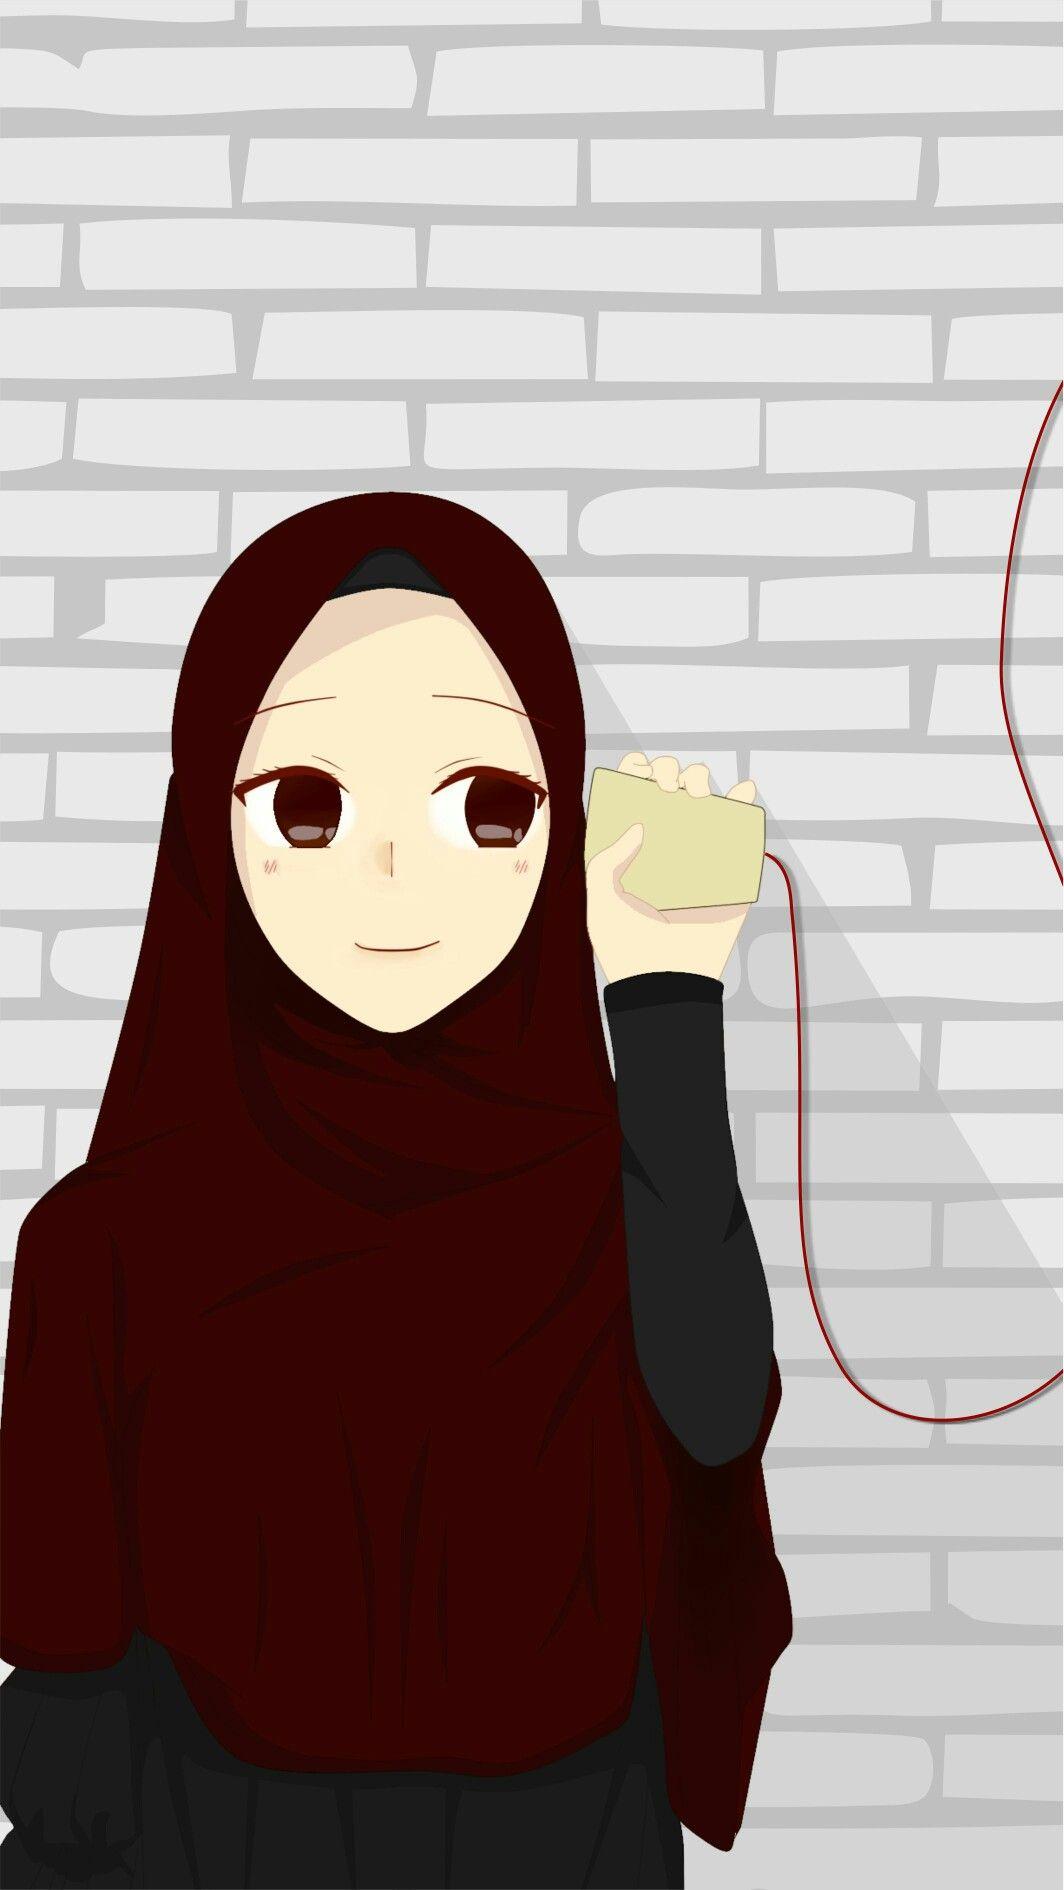 Gambar Kartun Lucu Pp Wa Couple Pacar - Download Kumpulan ...